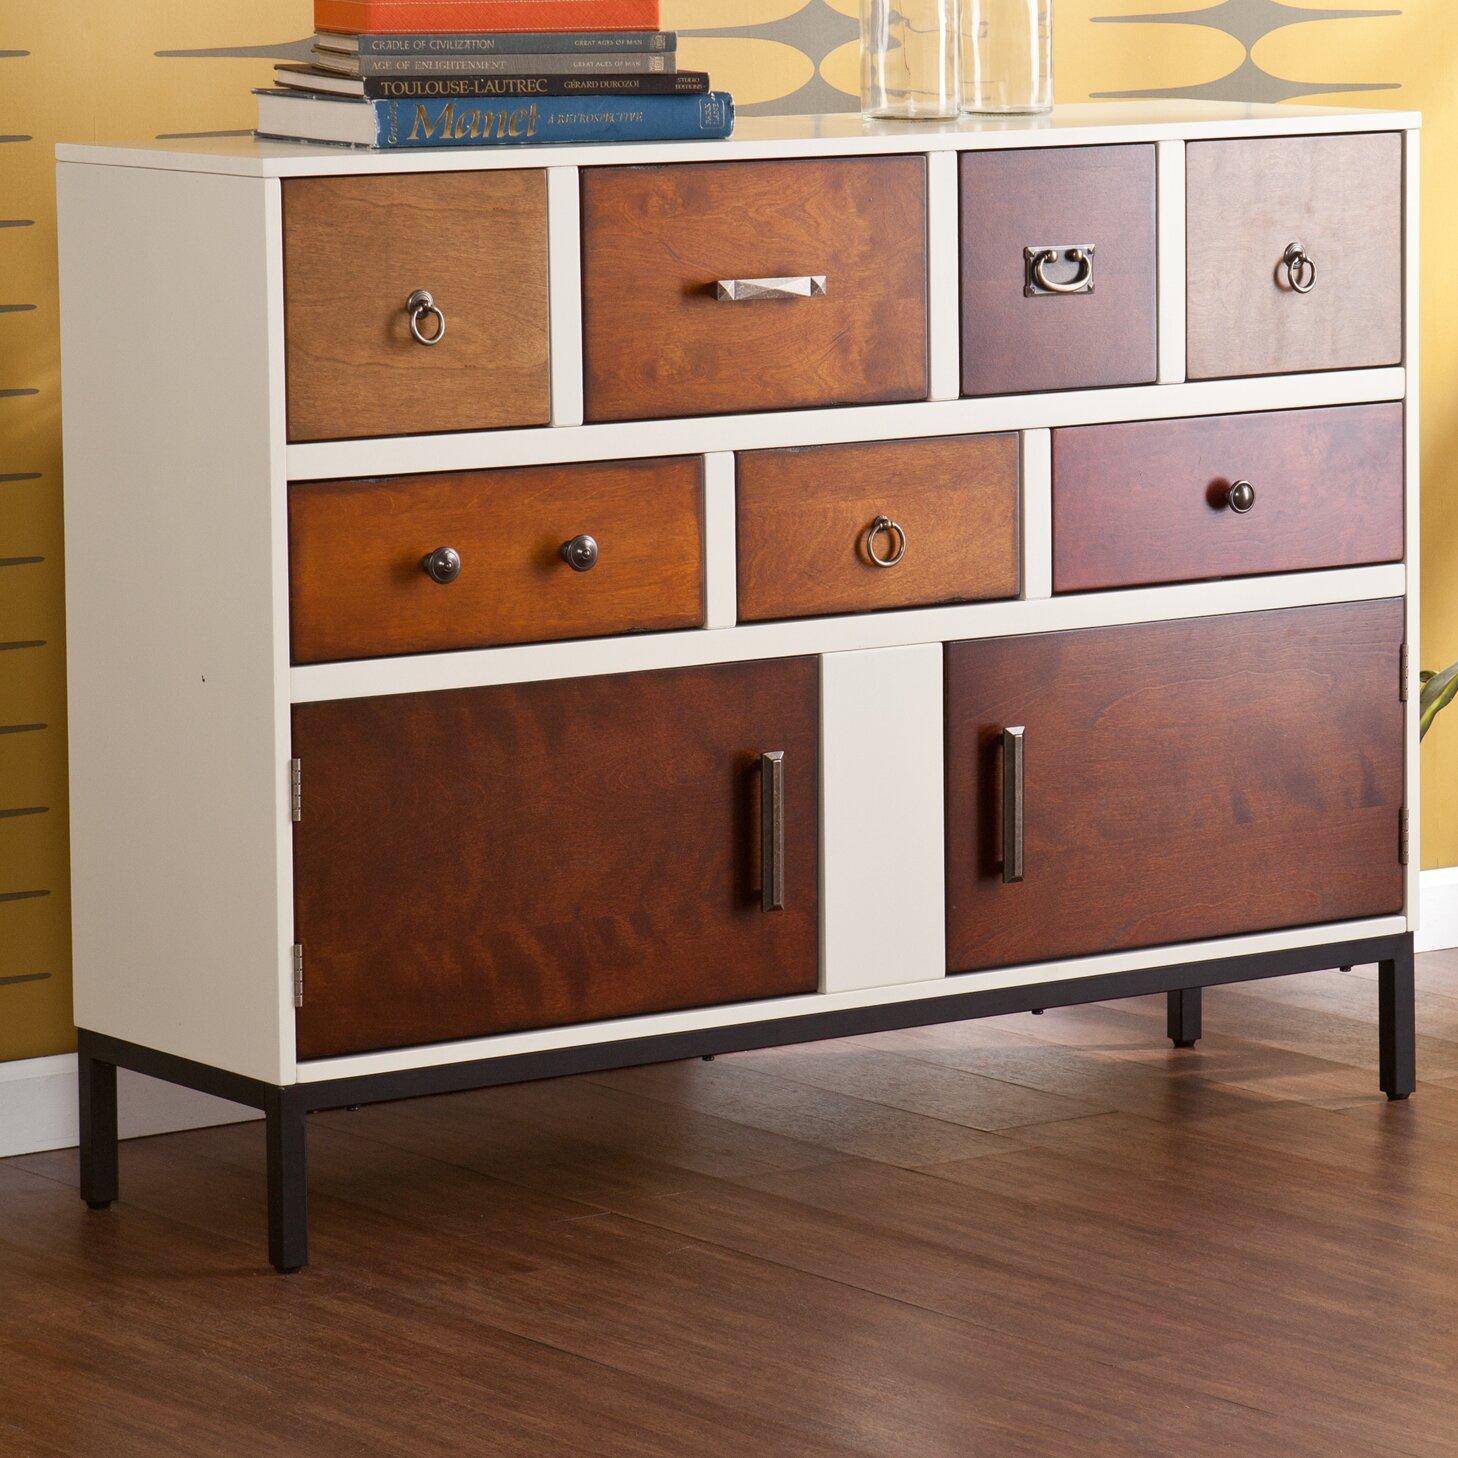 Home etc devlin 2 door 7 drawer cabinet reviews for Furniture etc reviews